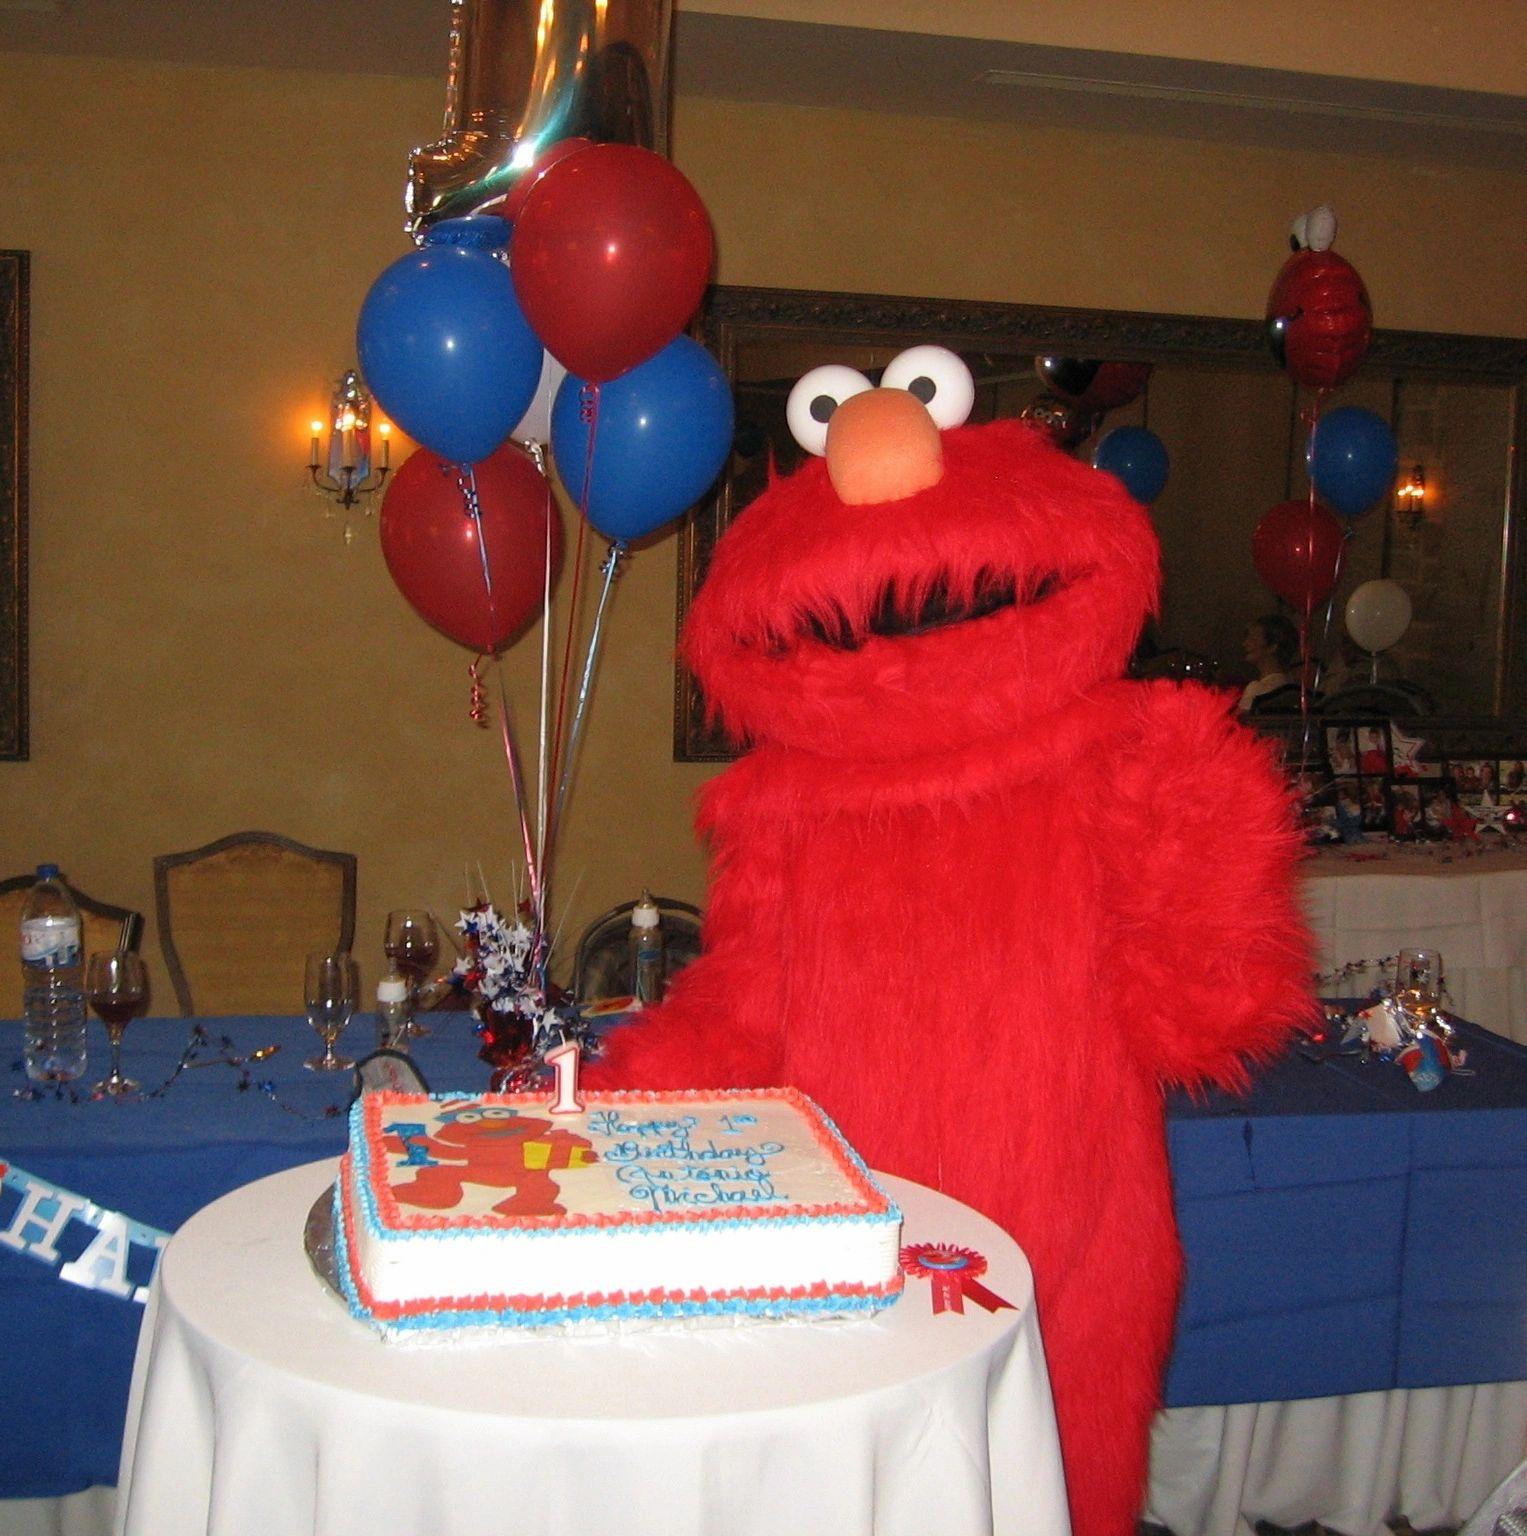 Birthday Party Entertainment Nj: Costume Character Birthday Party NJ